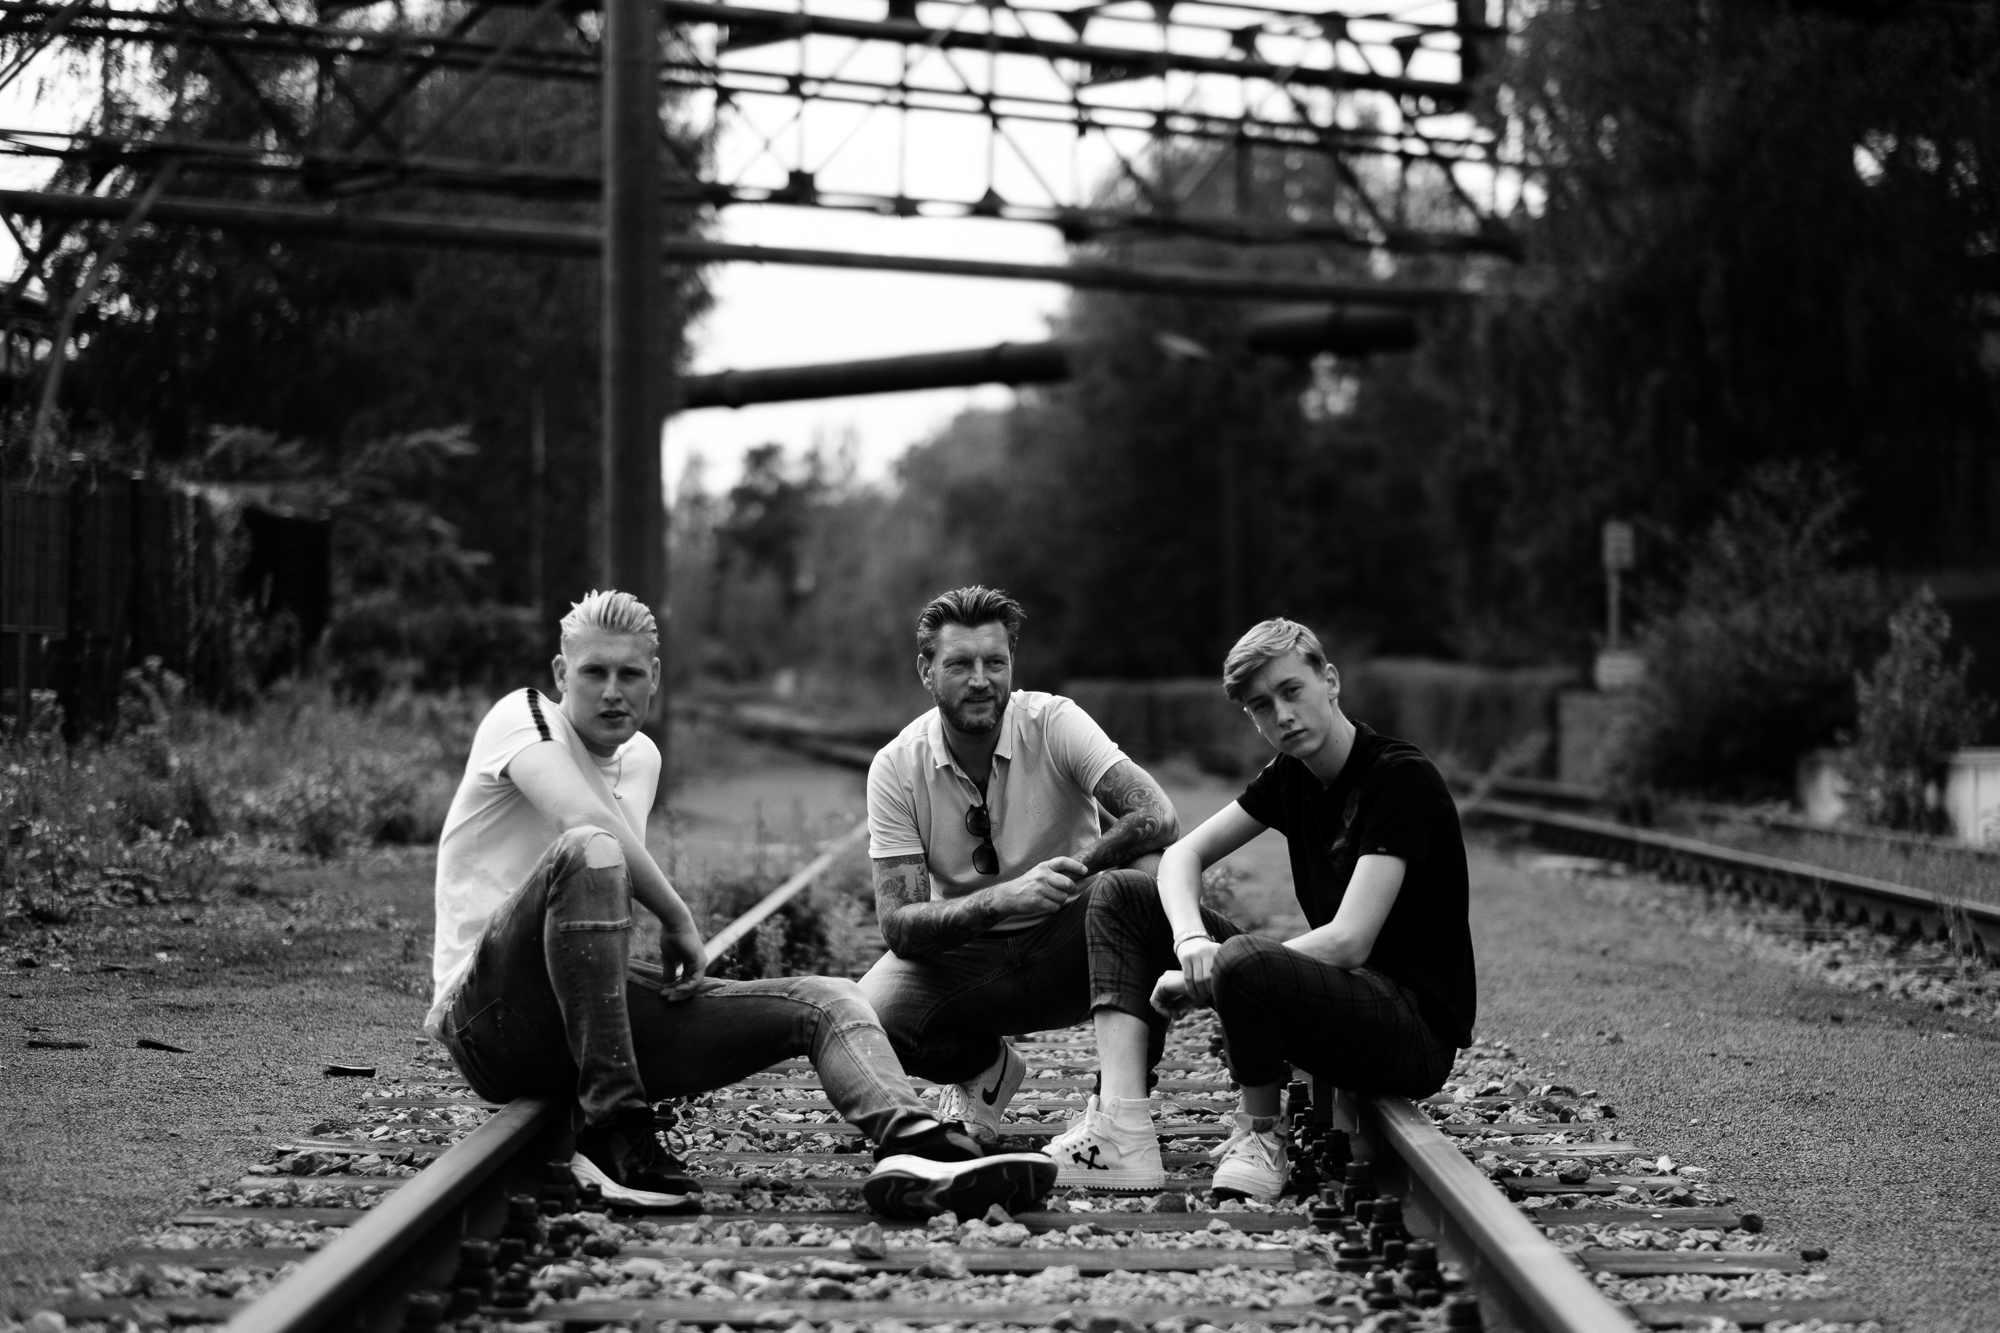 Group portrait on train tracks